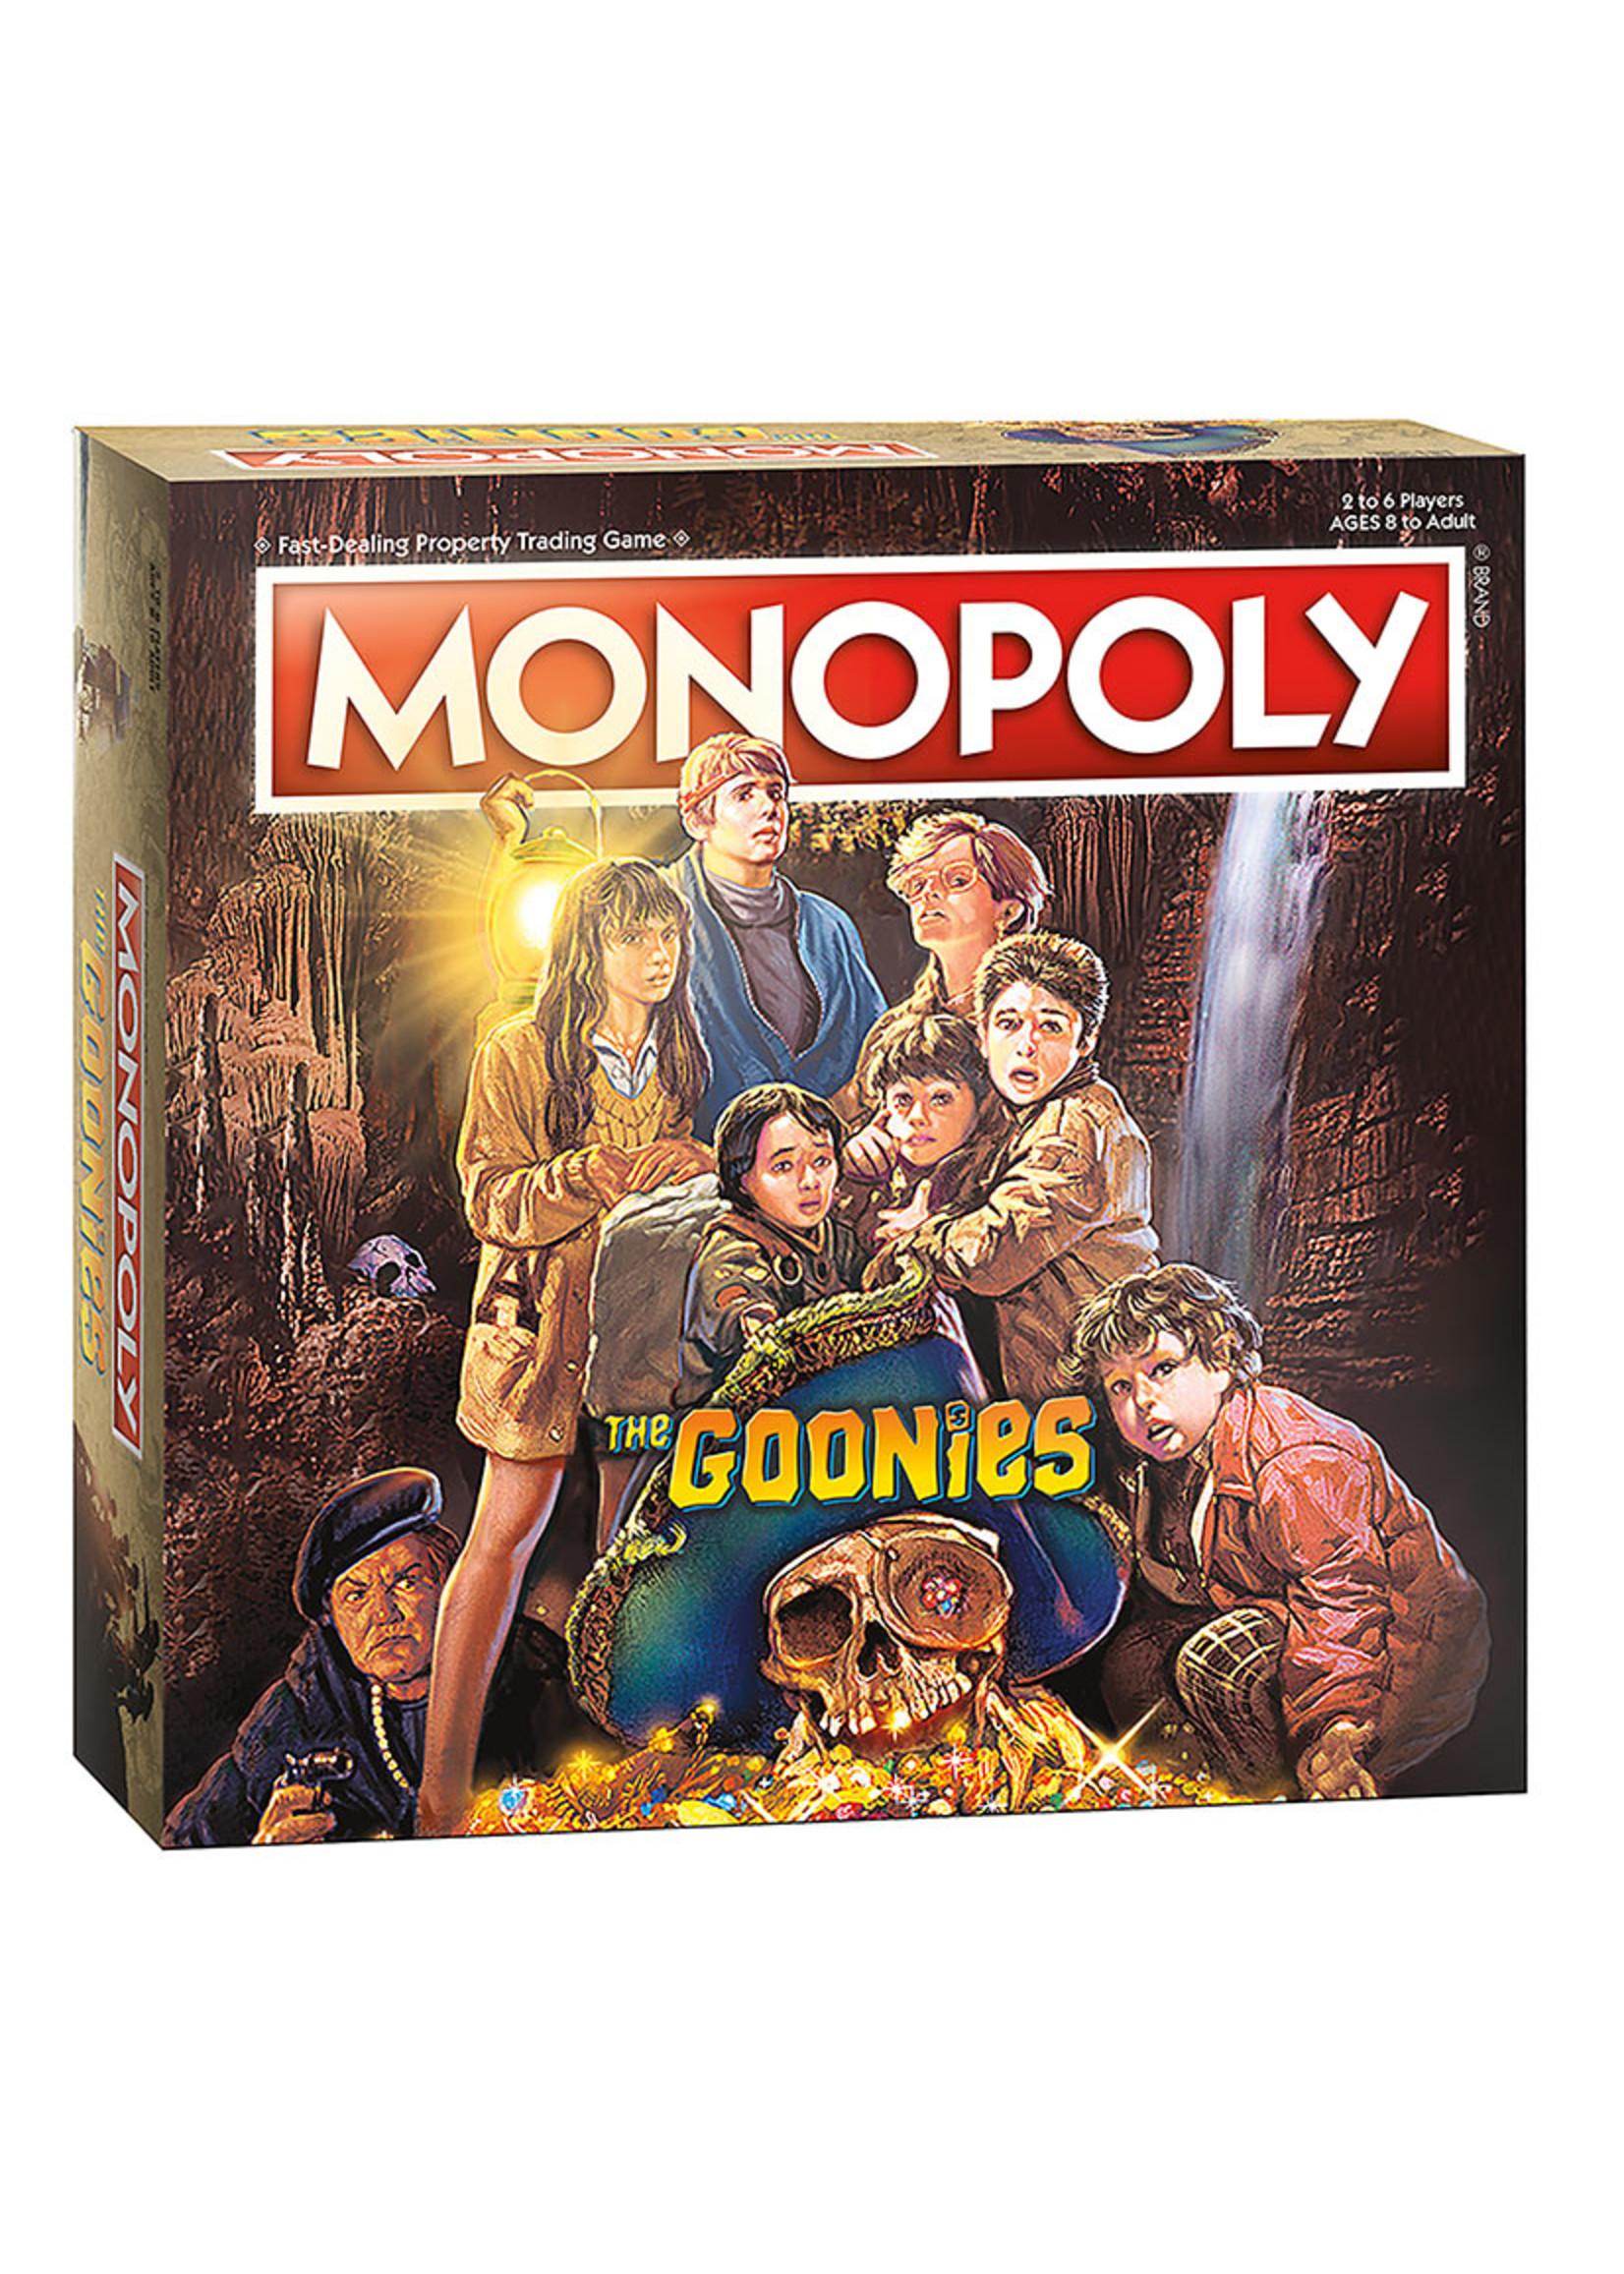 The OP Games Monopoly - The Goonies